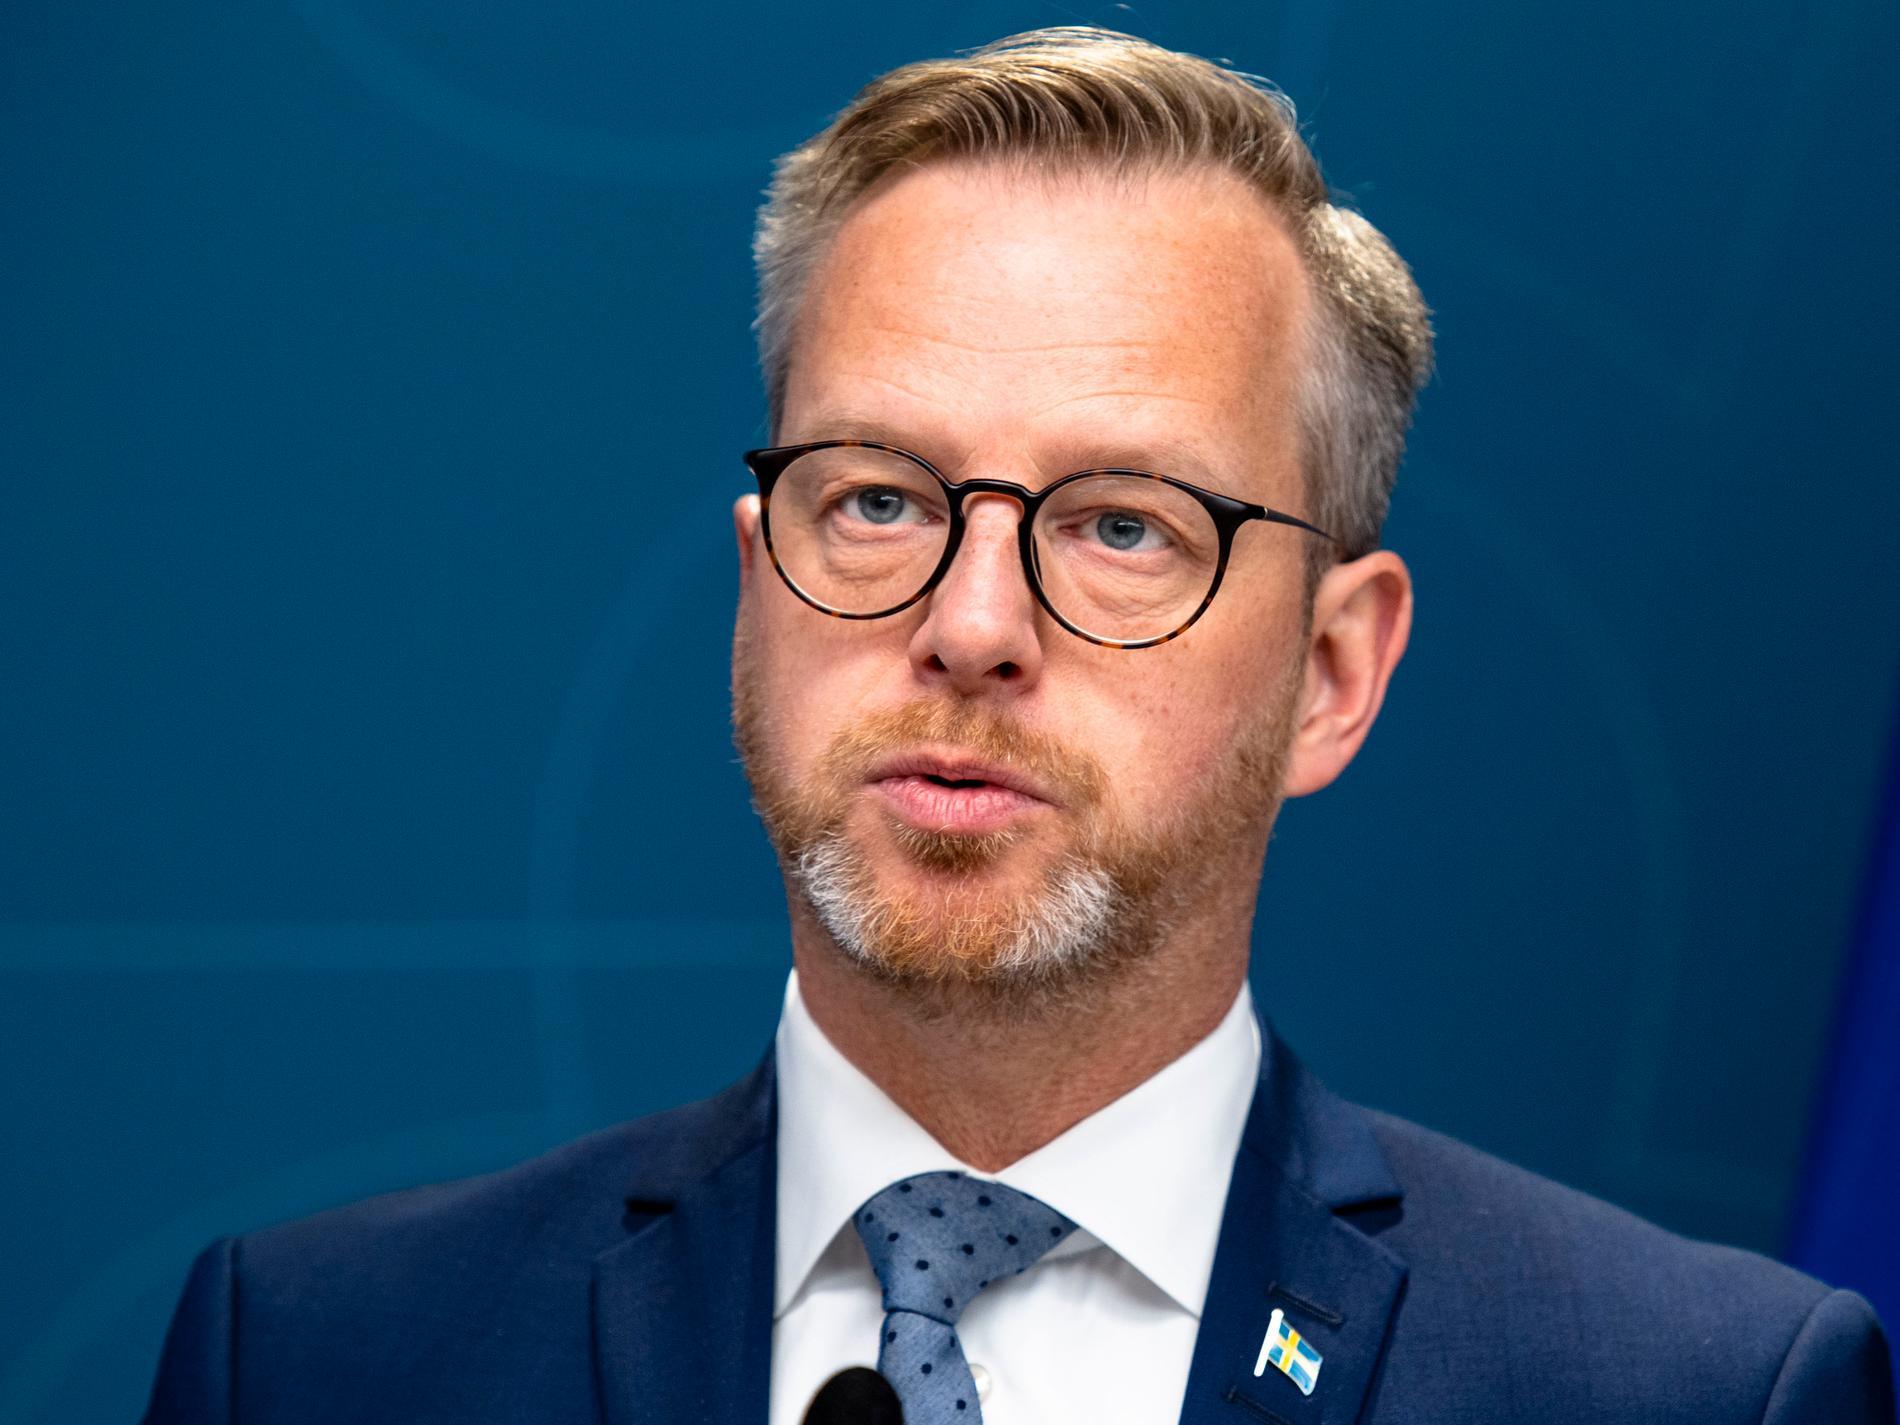 Inrikesminister Mikael Damberg (S).